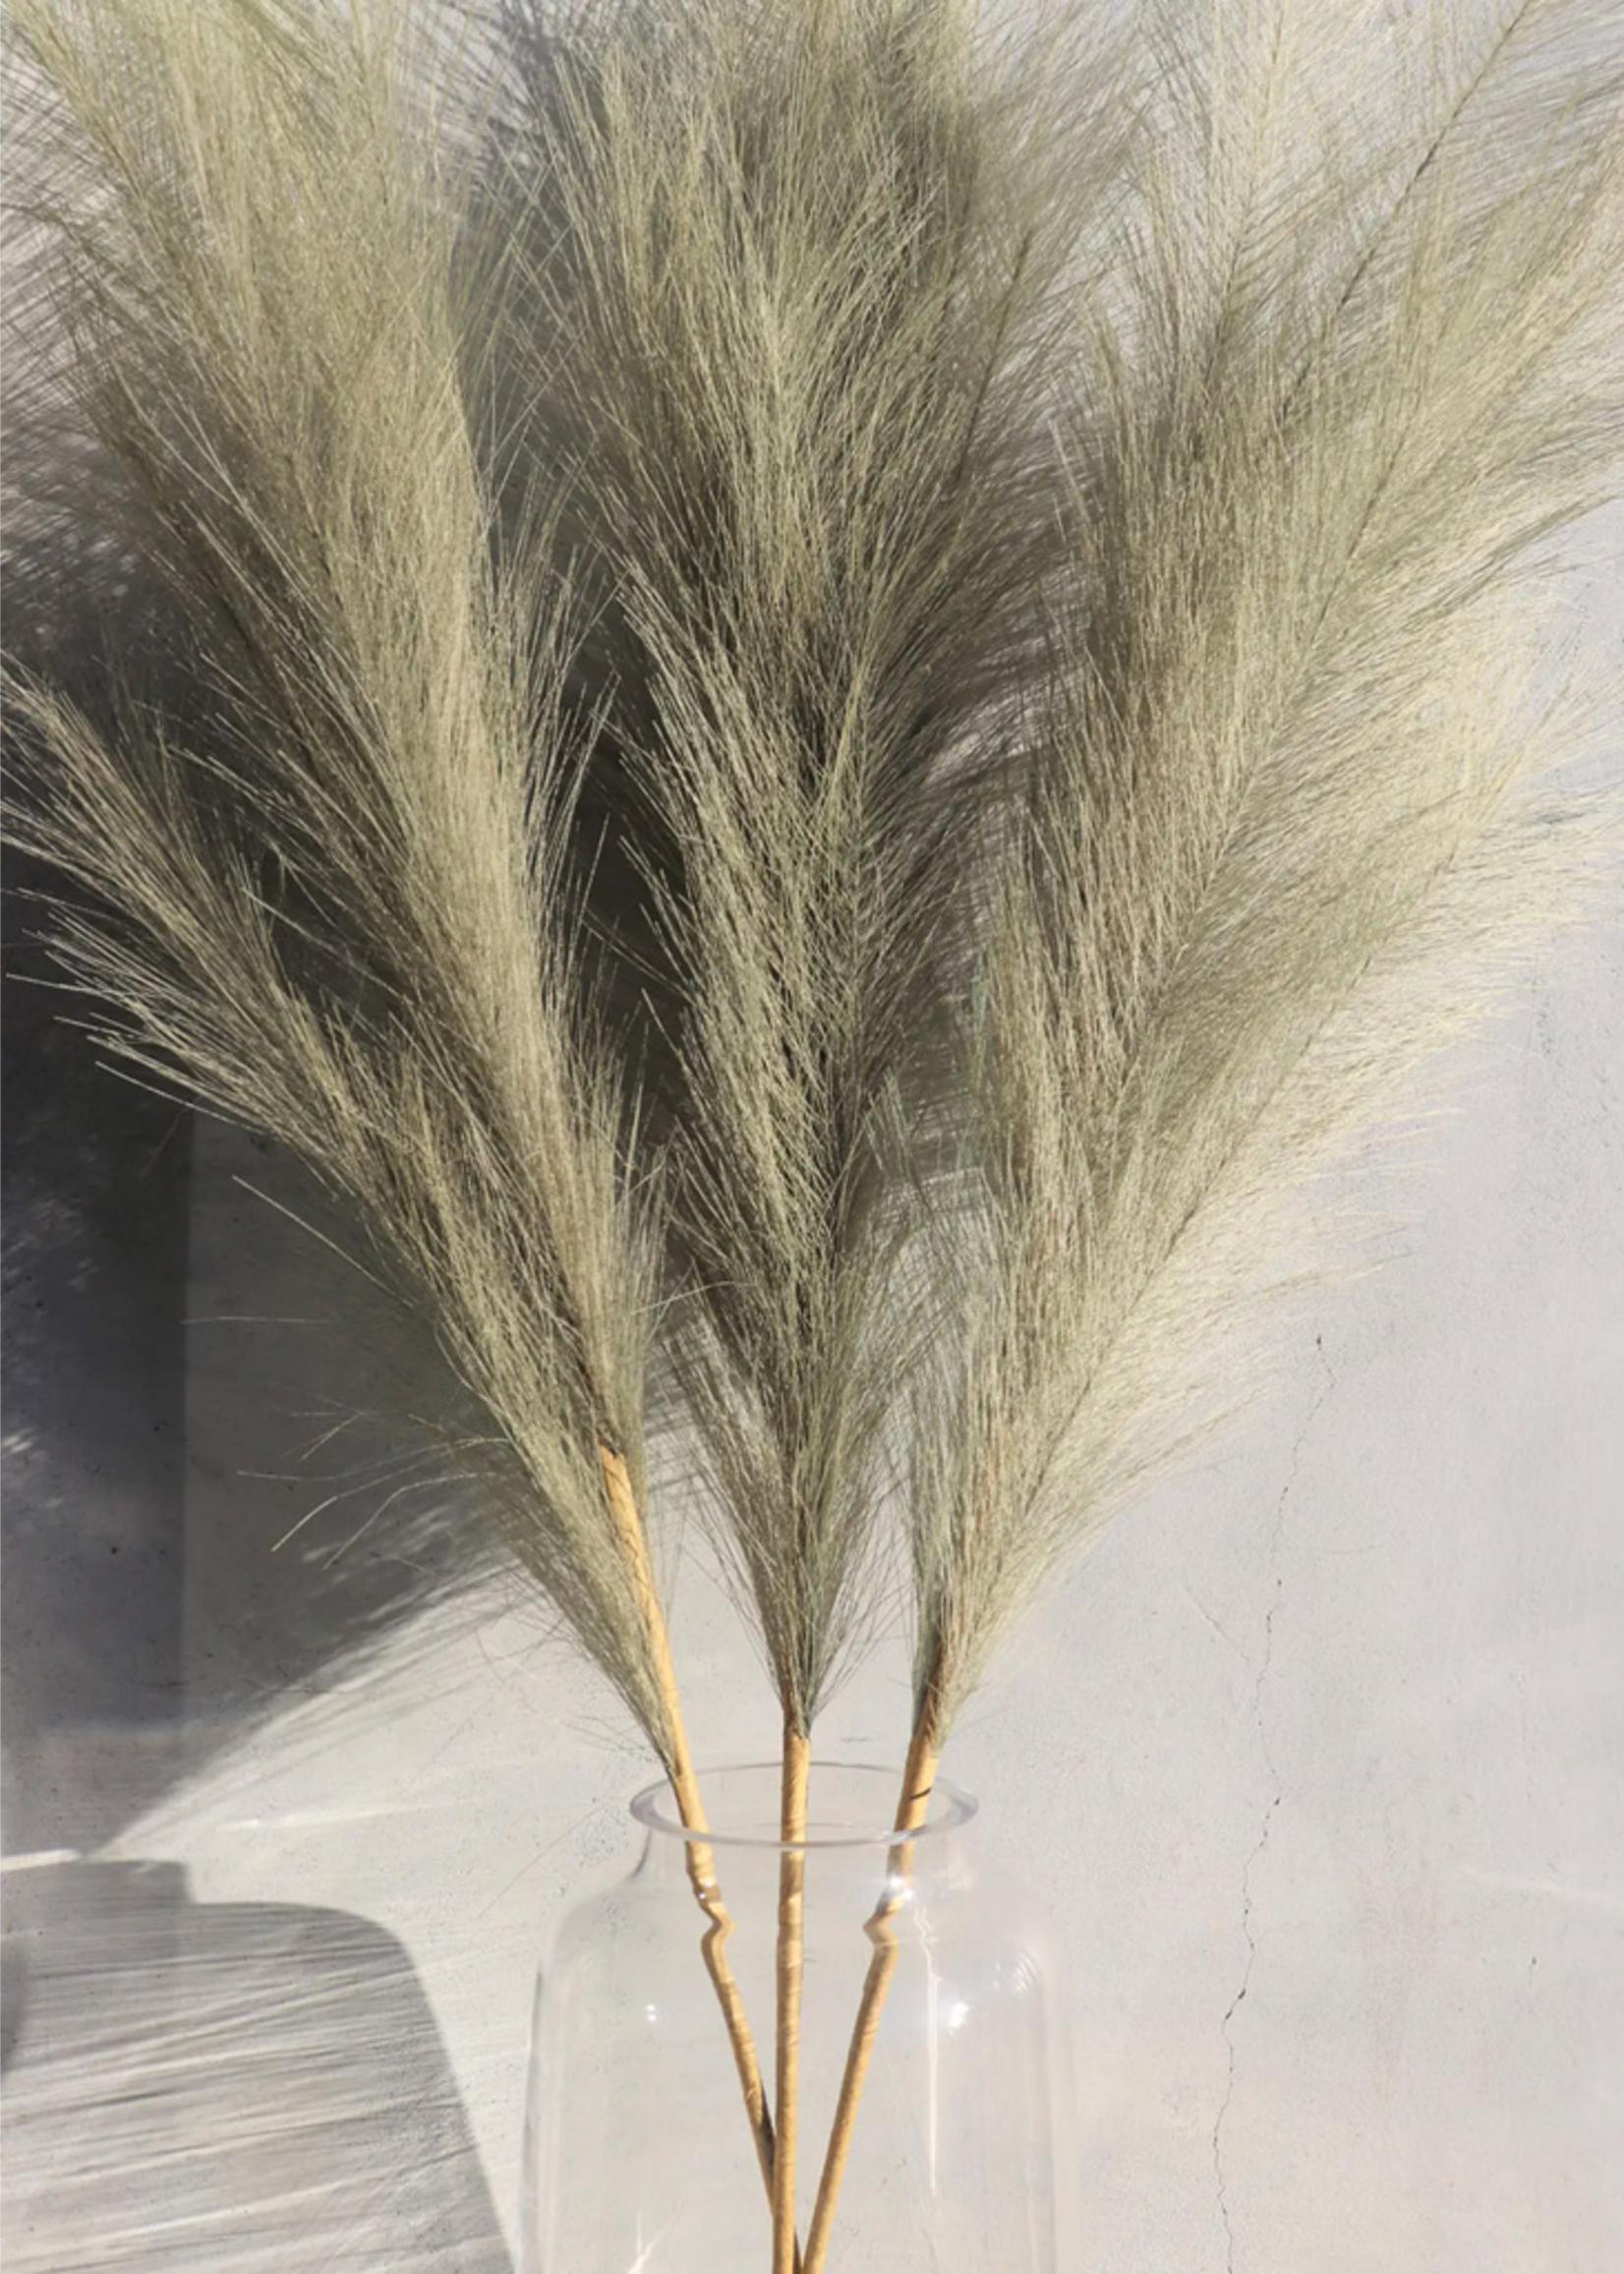 Large Olive Faux Pampas Grass - 1 Stem